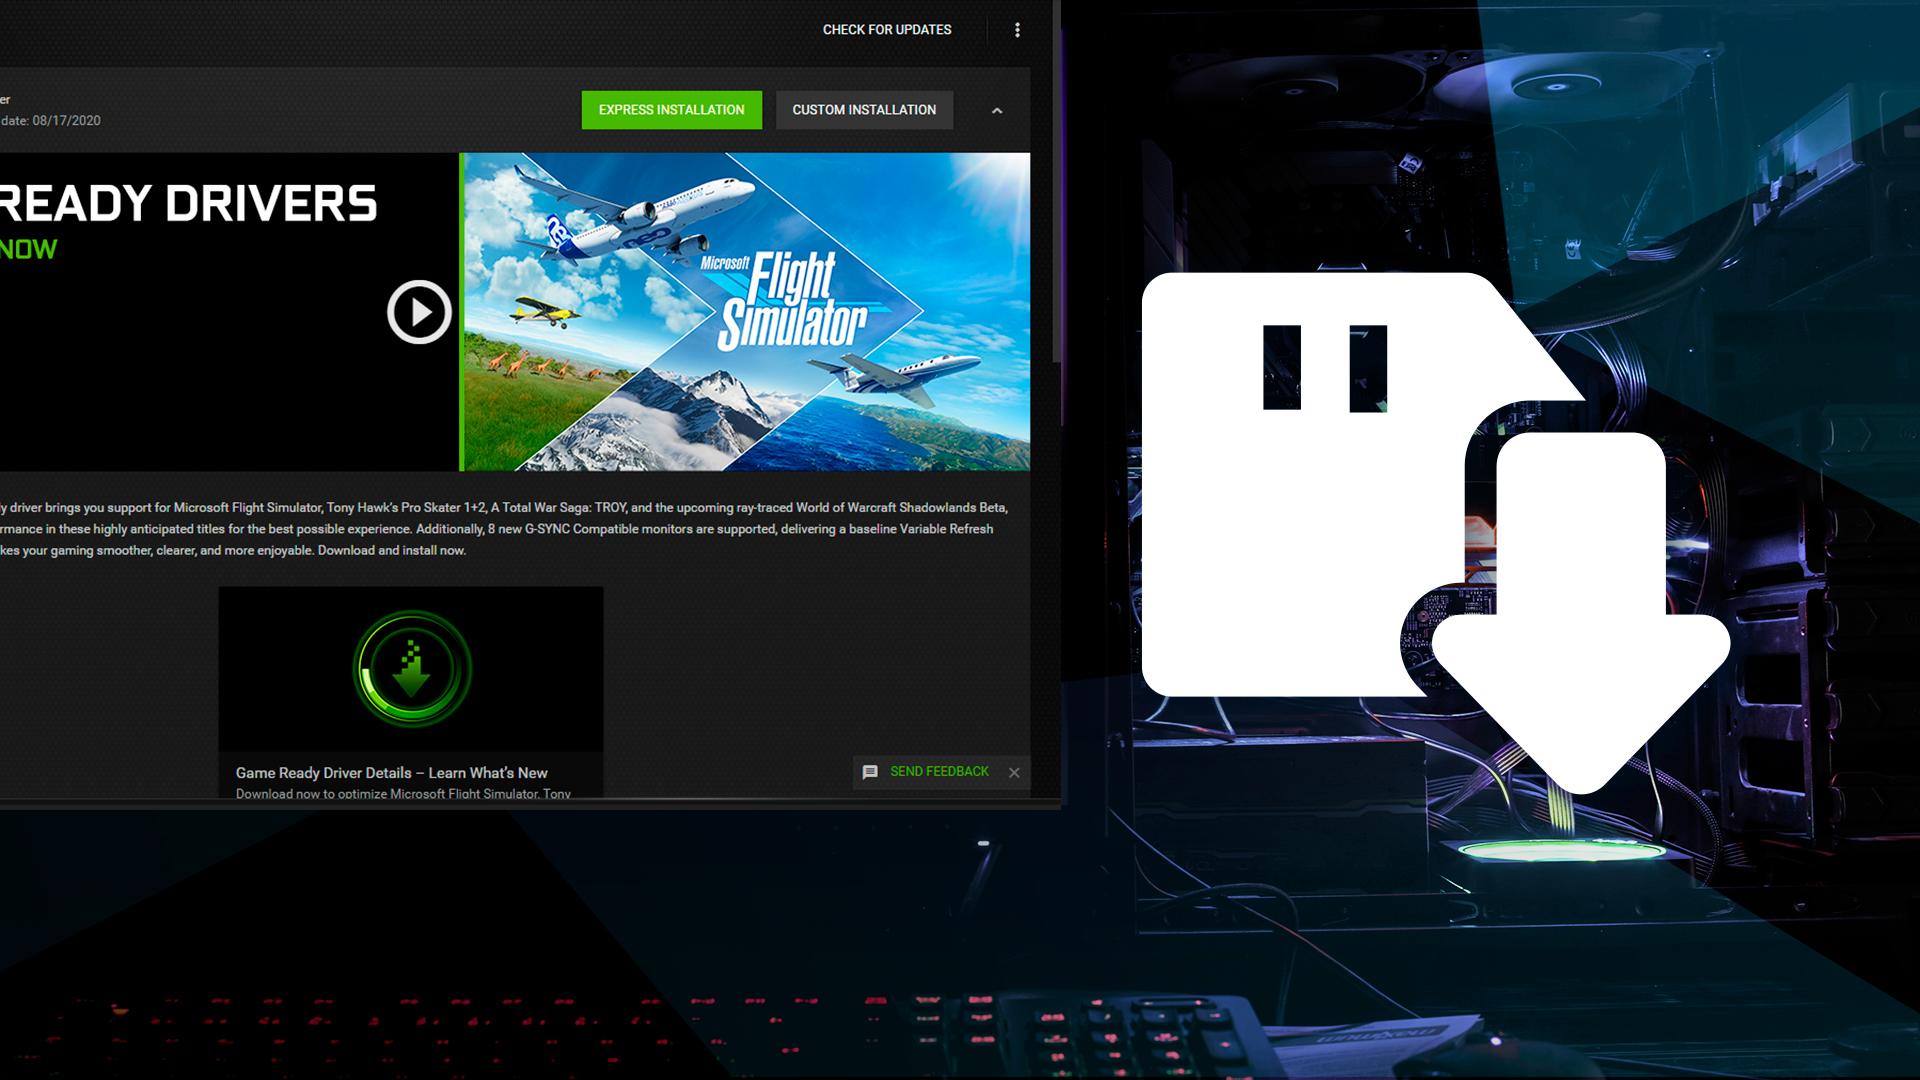 Gaming, Download, Nvidia, Grafikkarte, Treiber, Nvidia Geforce, Driver, Nvidia Treiber, nvidia download, Grafik-Treiber